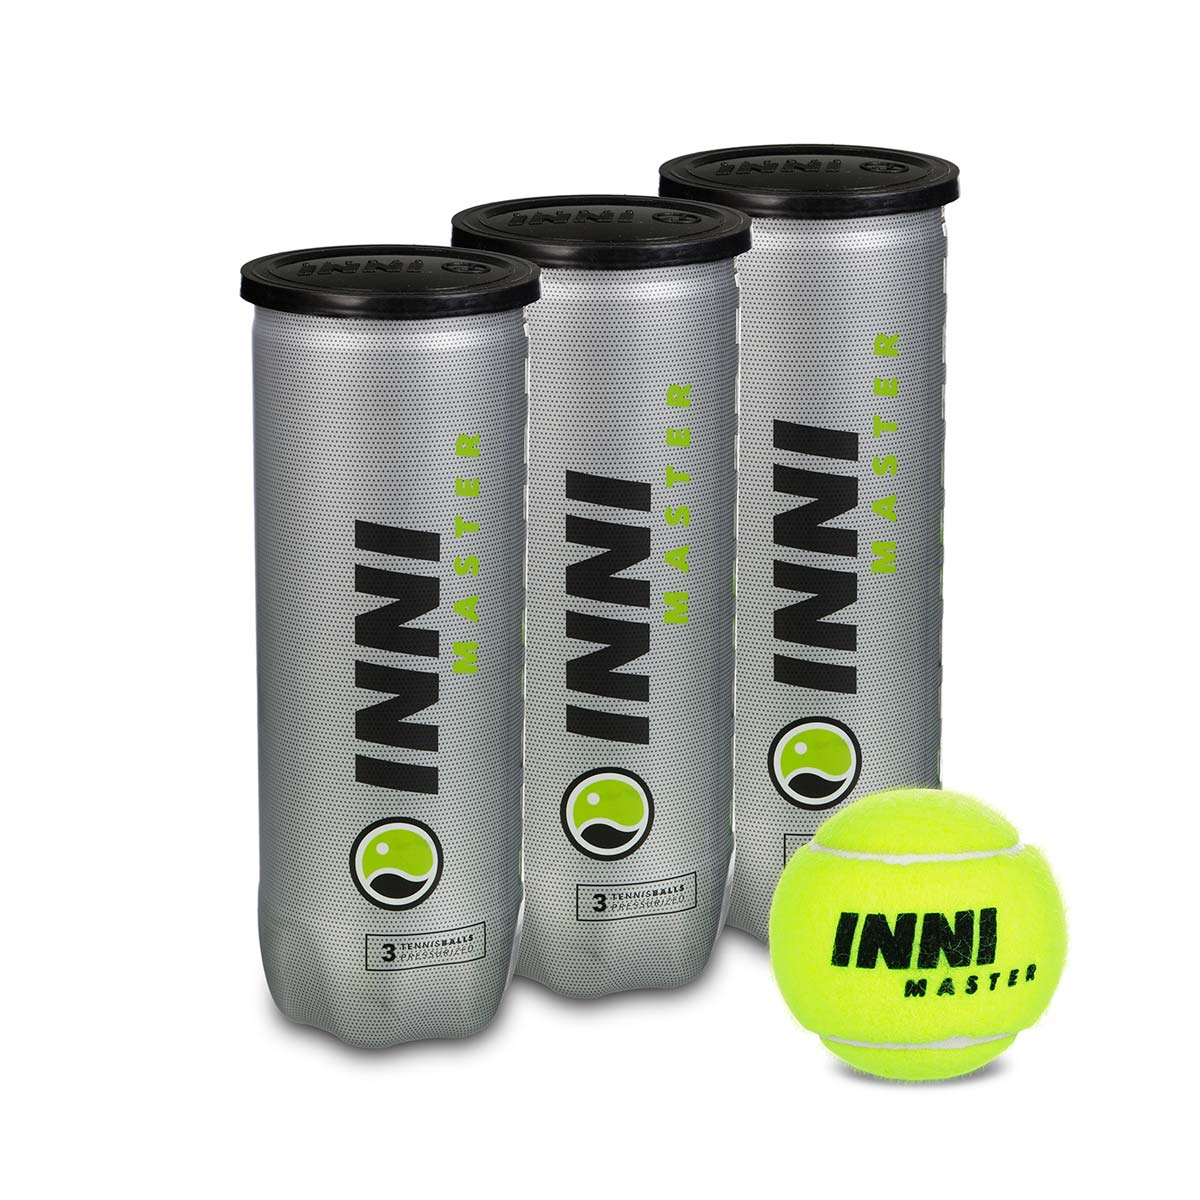 Bola De Tênis Inni Master Pack c/ 3 Tubos